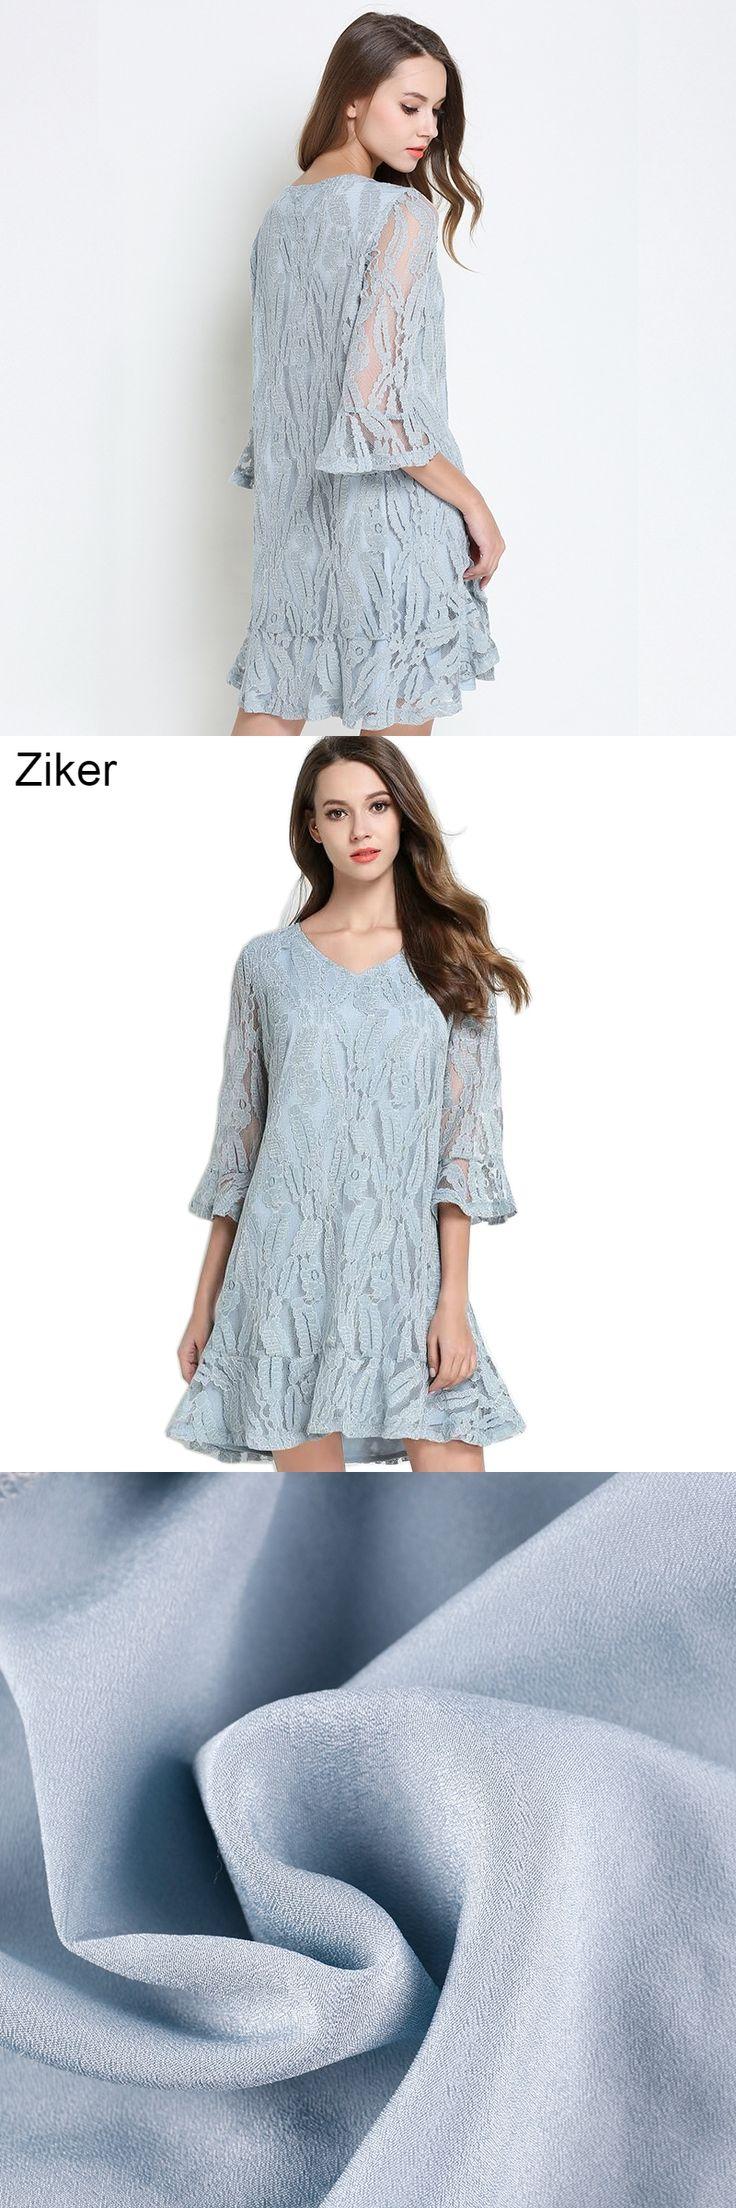 Ziker New 2017 Fashion Summer Lace Dresses Women Sexy V-Neck Half Sleeve Plus Size Dress XL-5XL